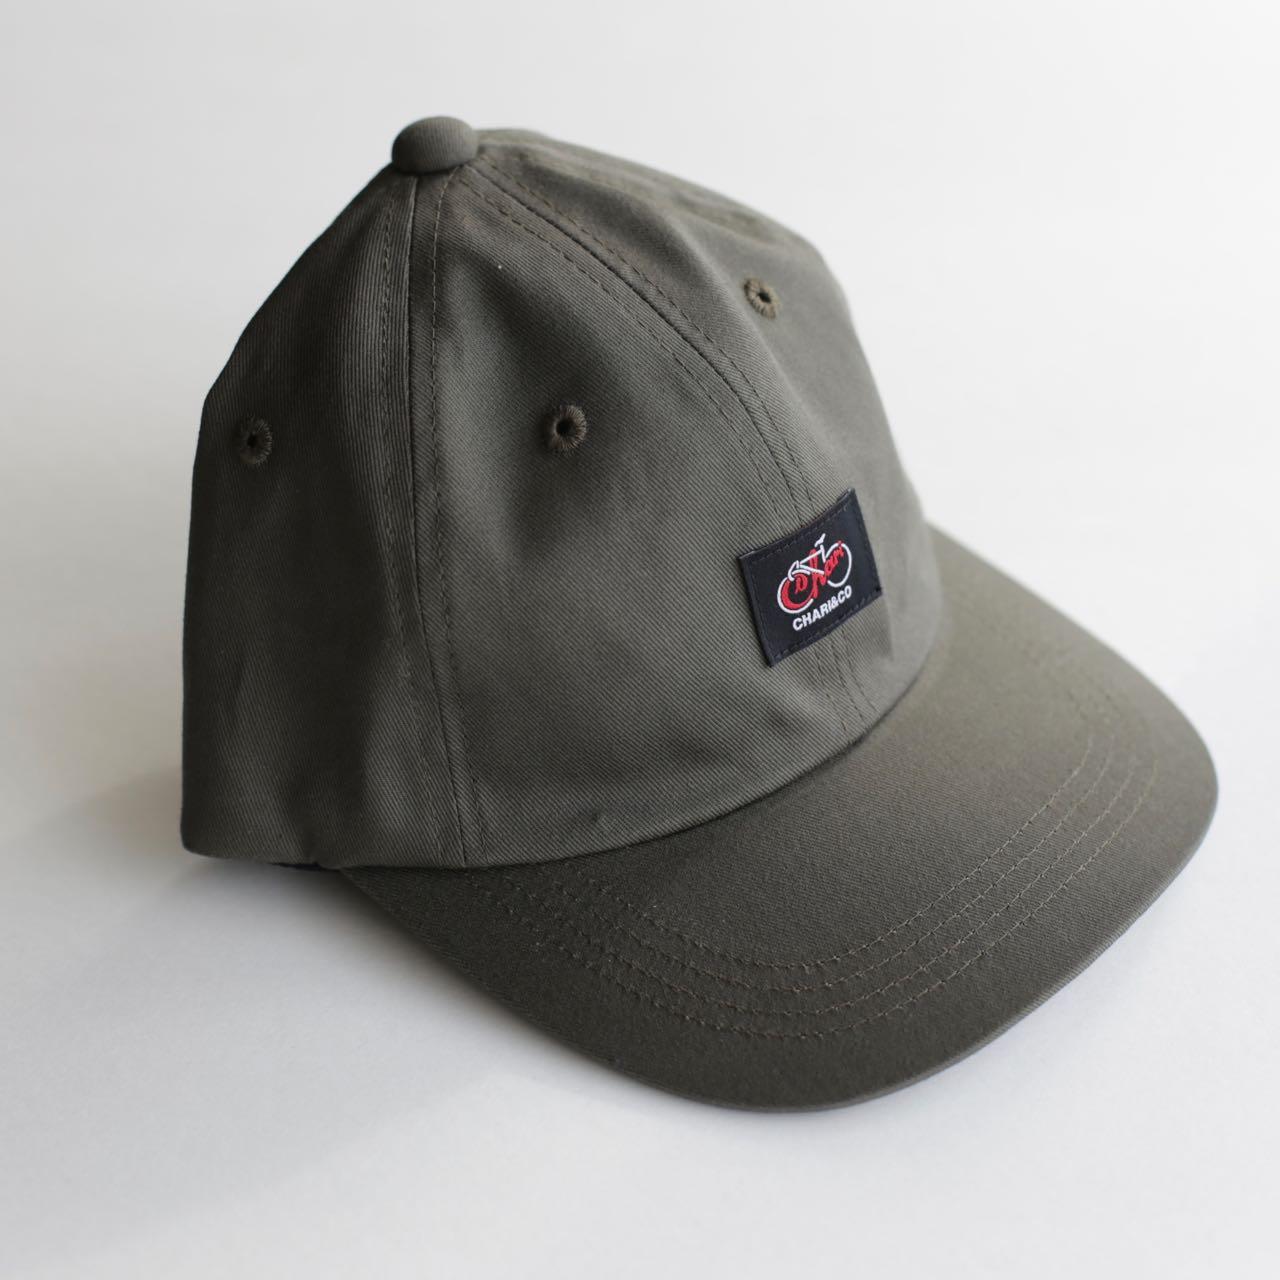 【30%OFF】CYCLE LOGO POLO CAP キャップ レッドのみ 帽子  CHARI&CO チャリアンドコー